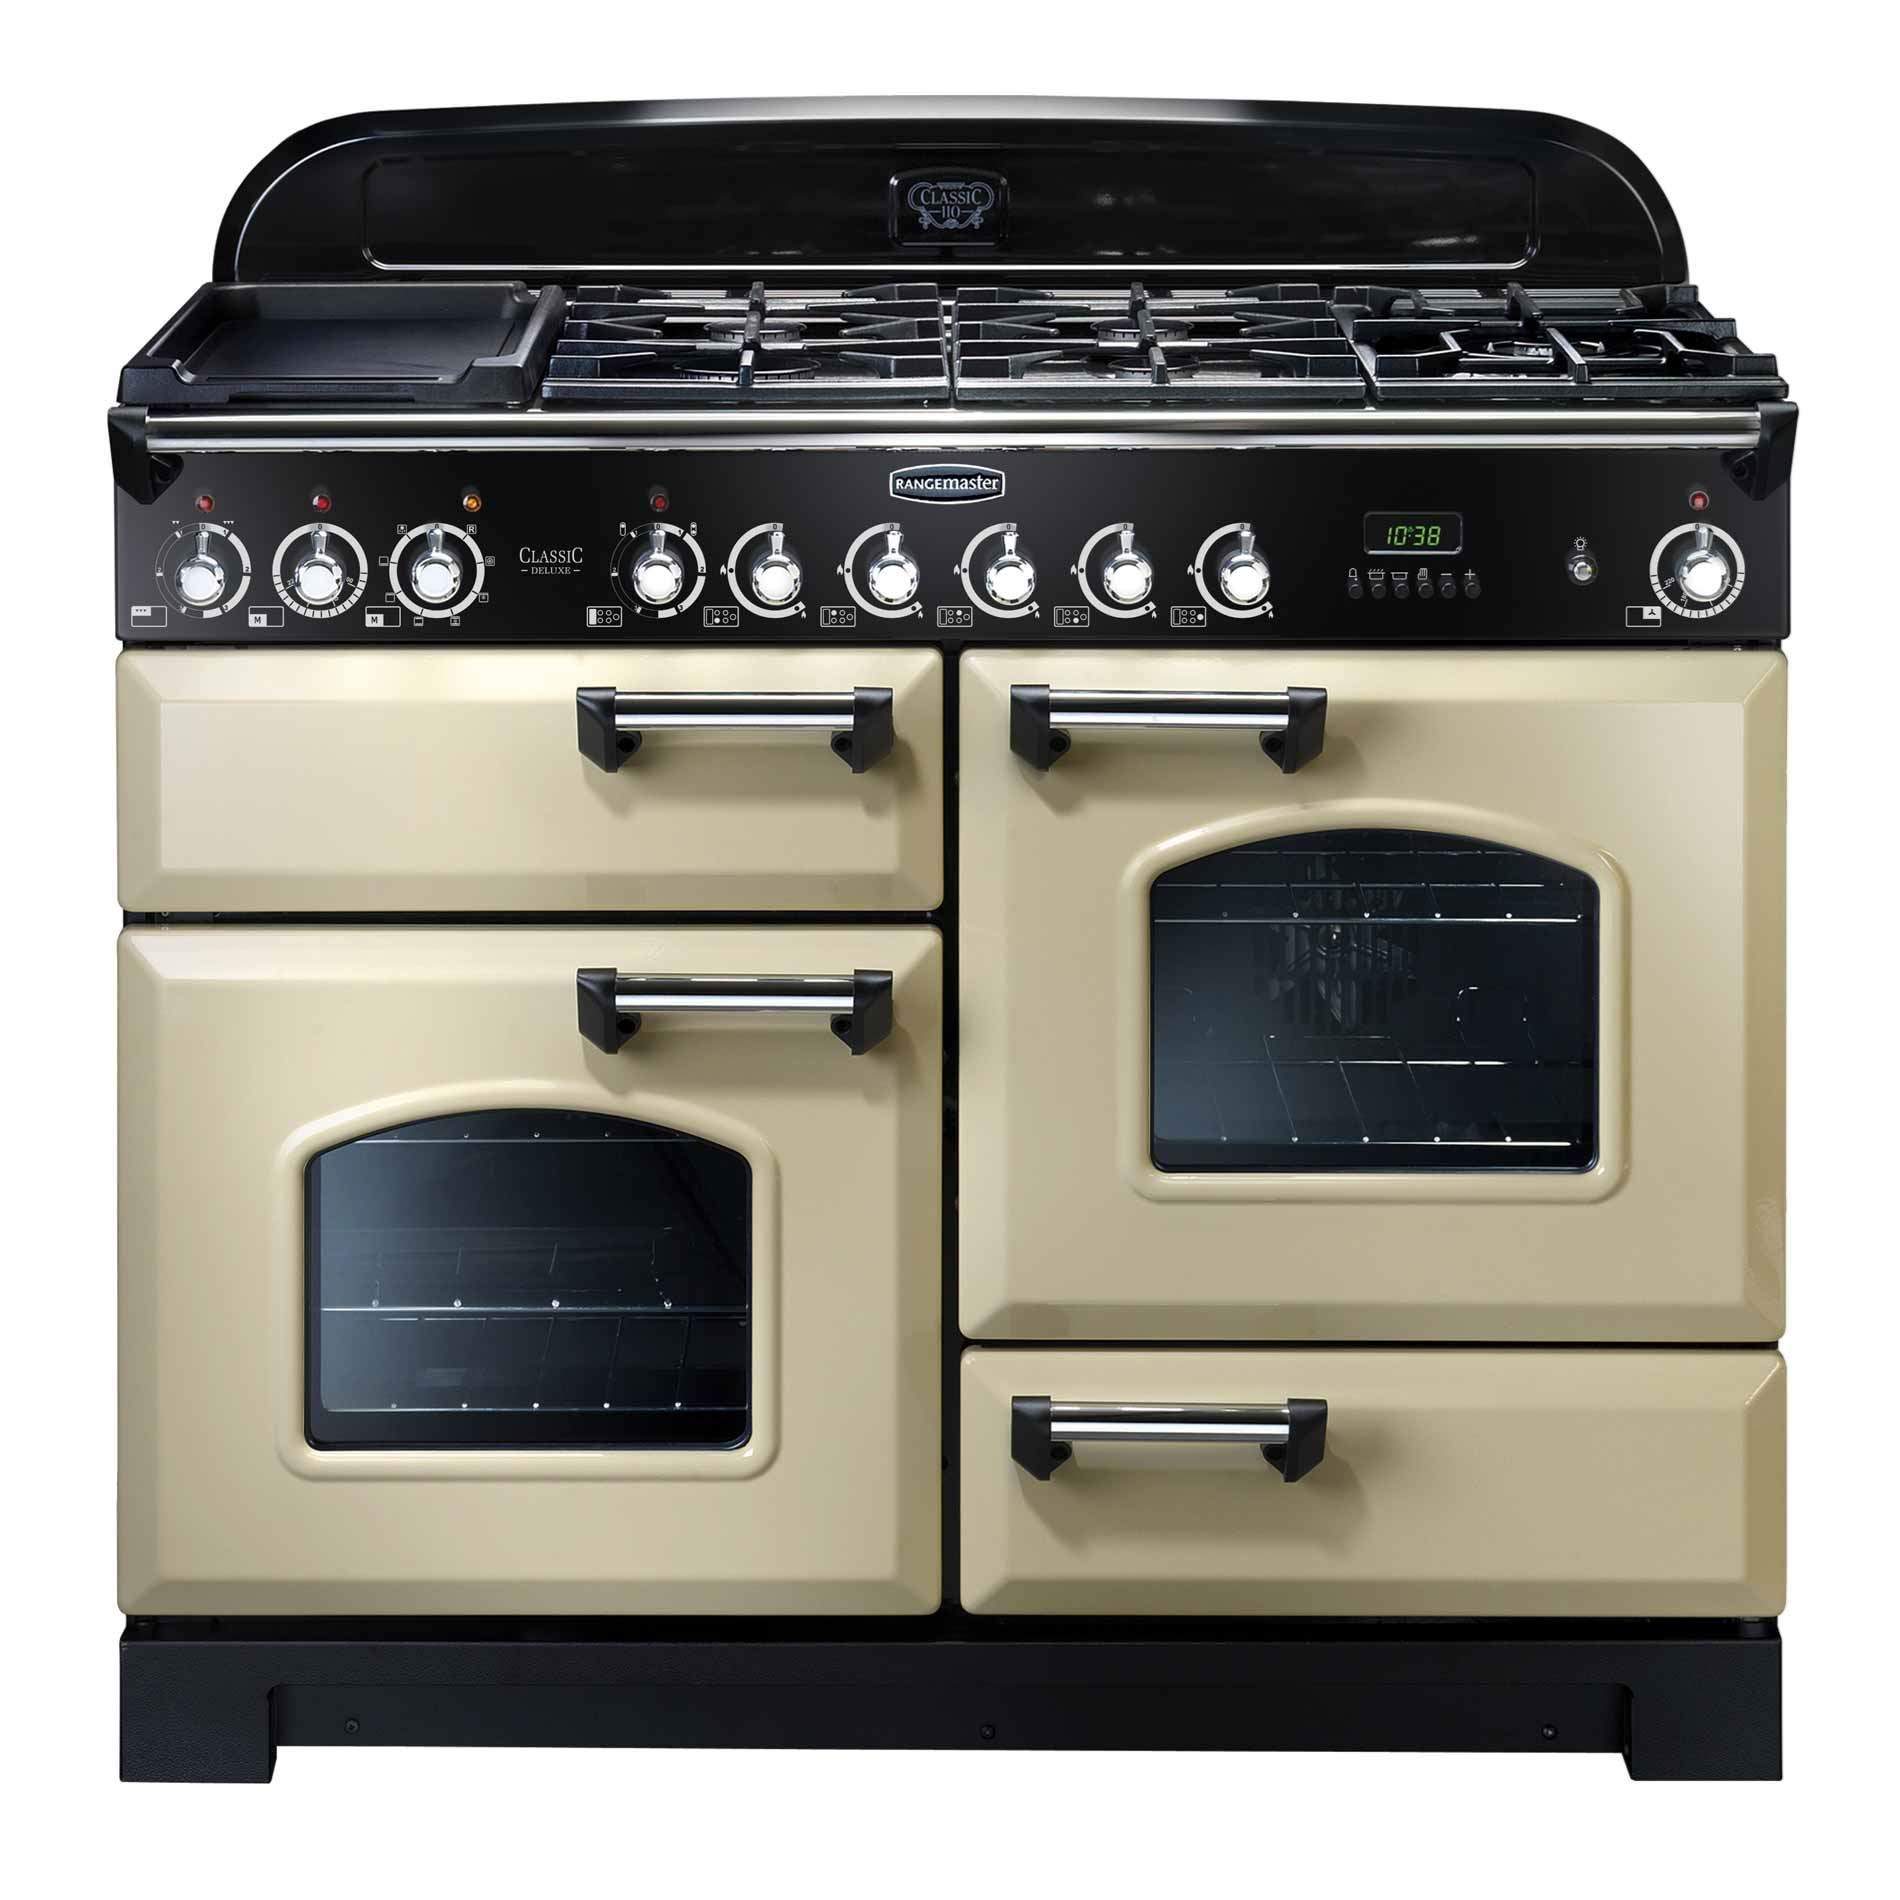 Picture of Classic Deluxe 110 Dual Fuel Cream Range Cooker